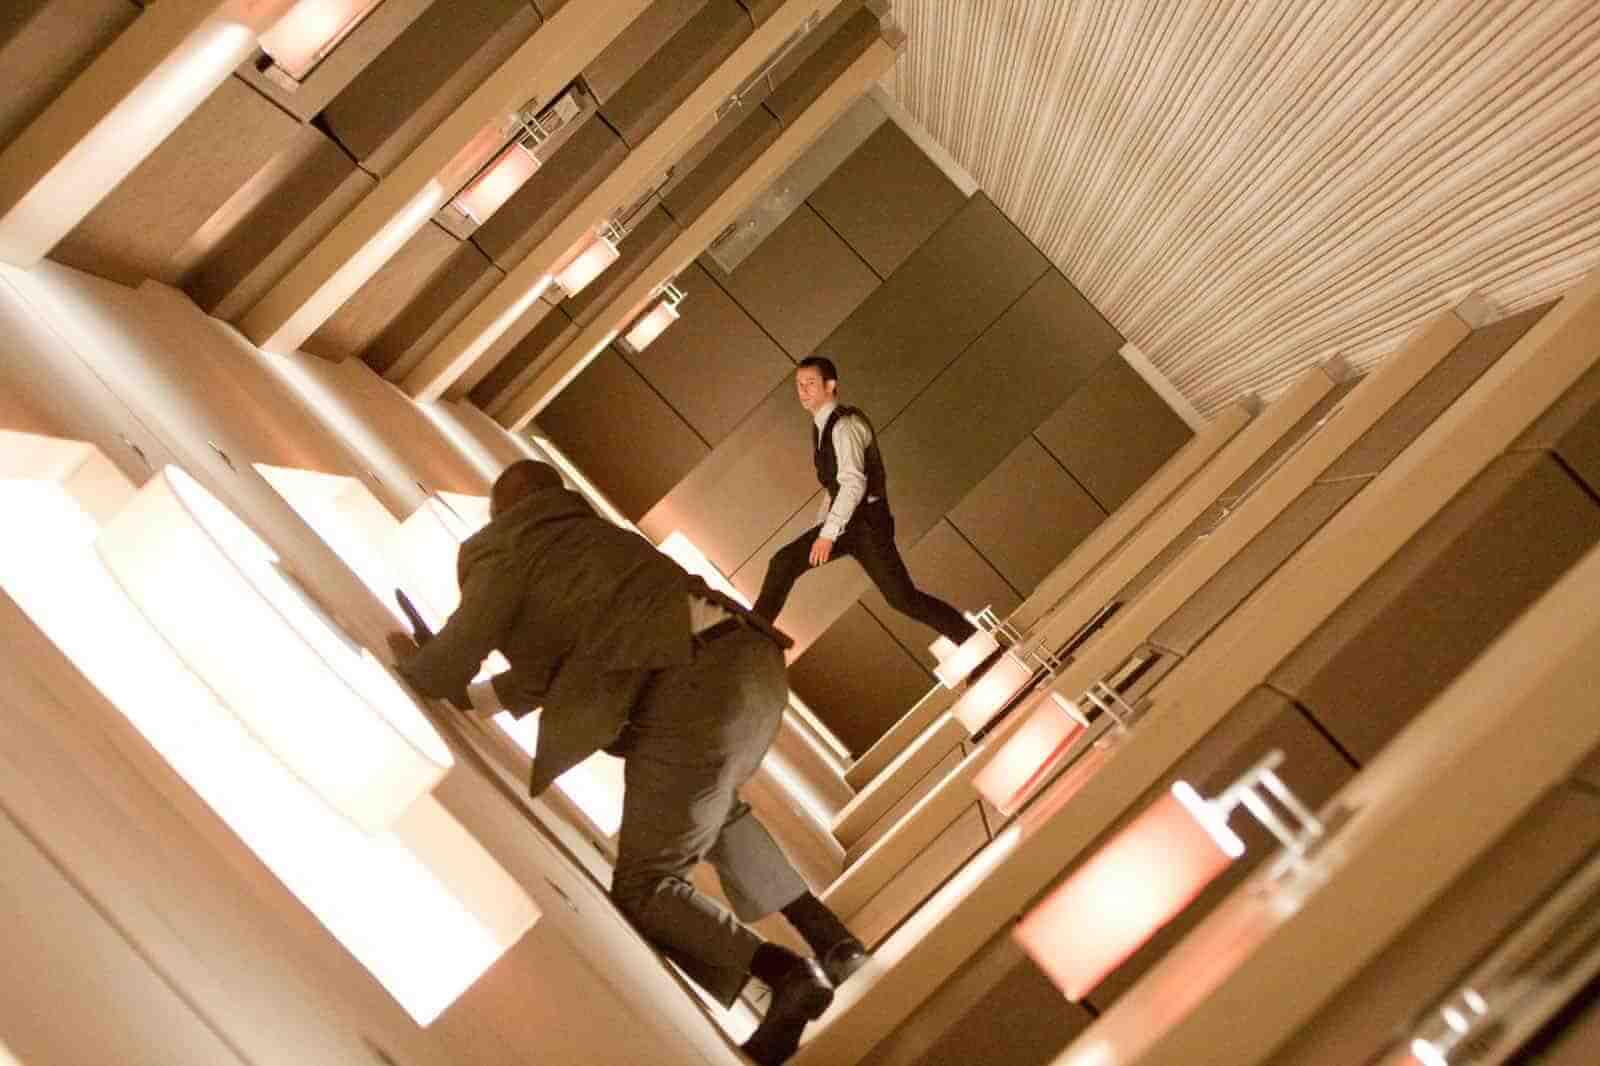 Dutch Angle - Camera Shots - Inception Hallway